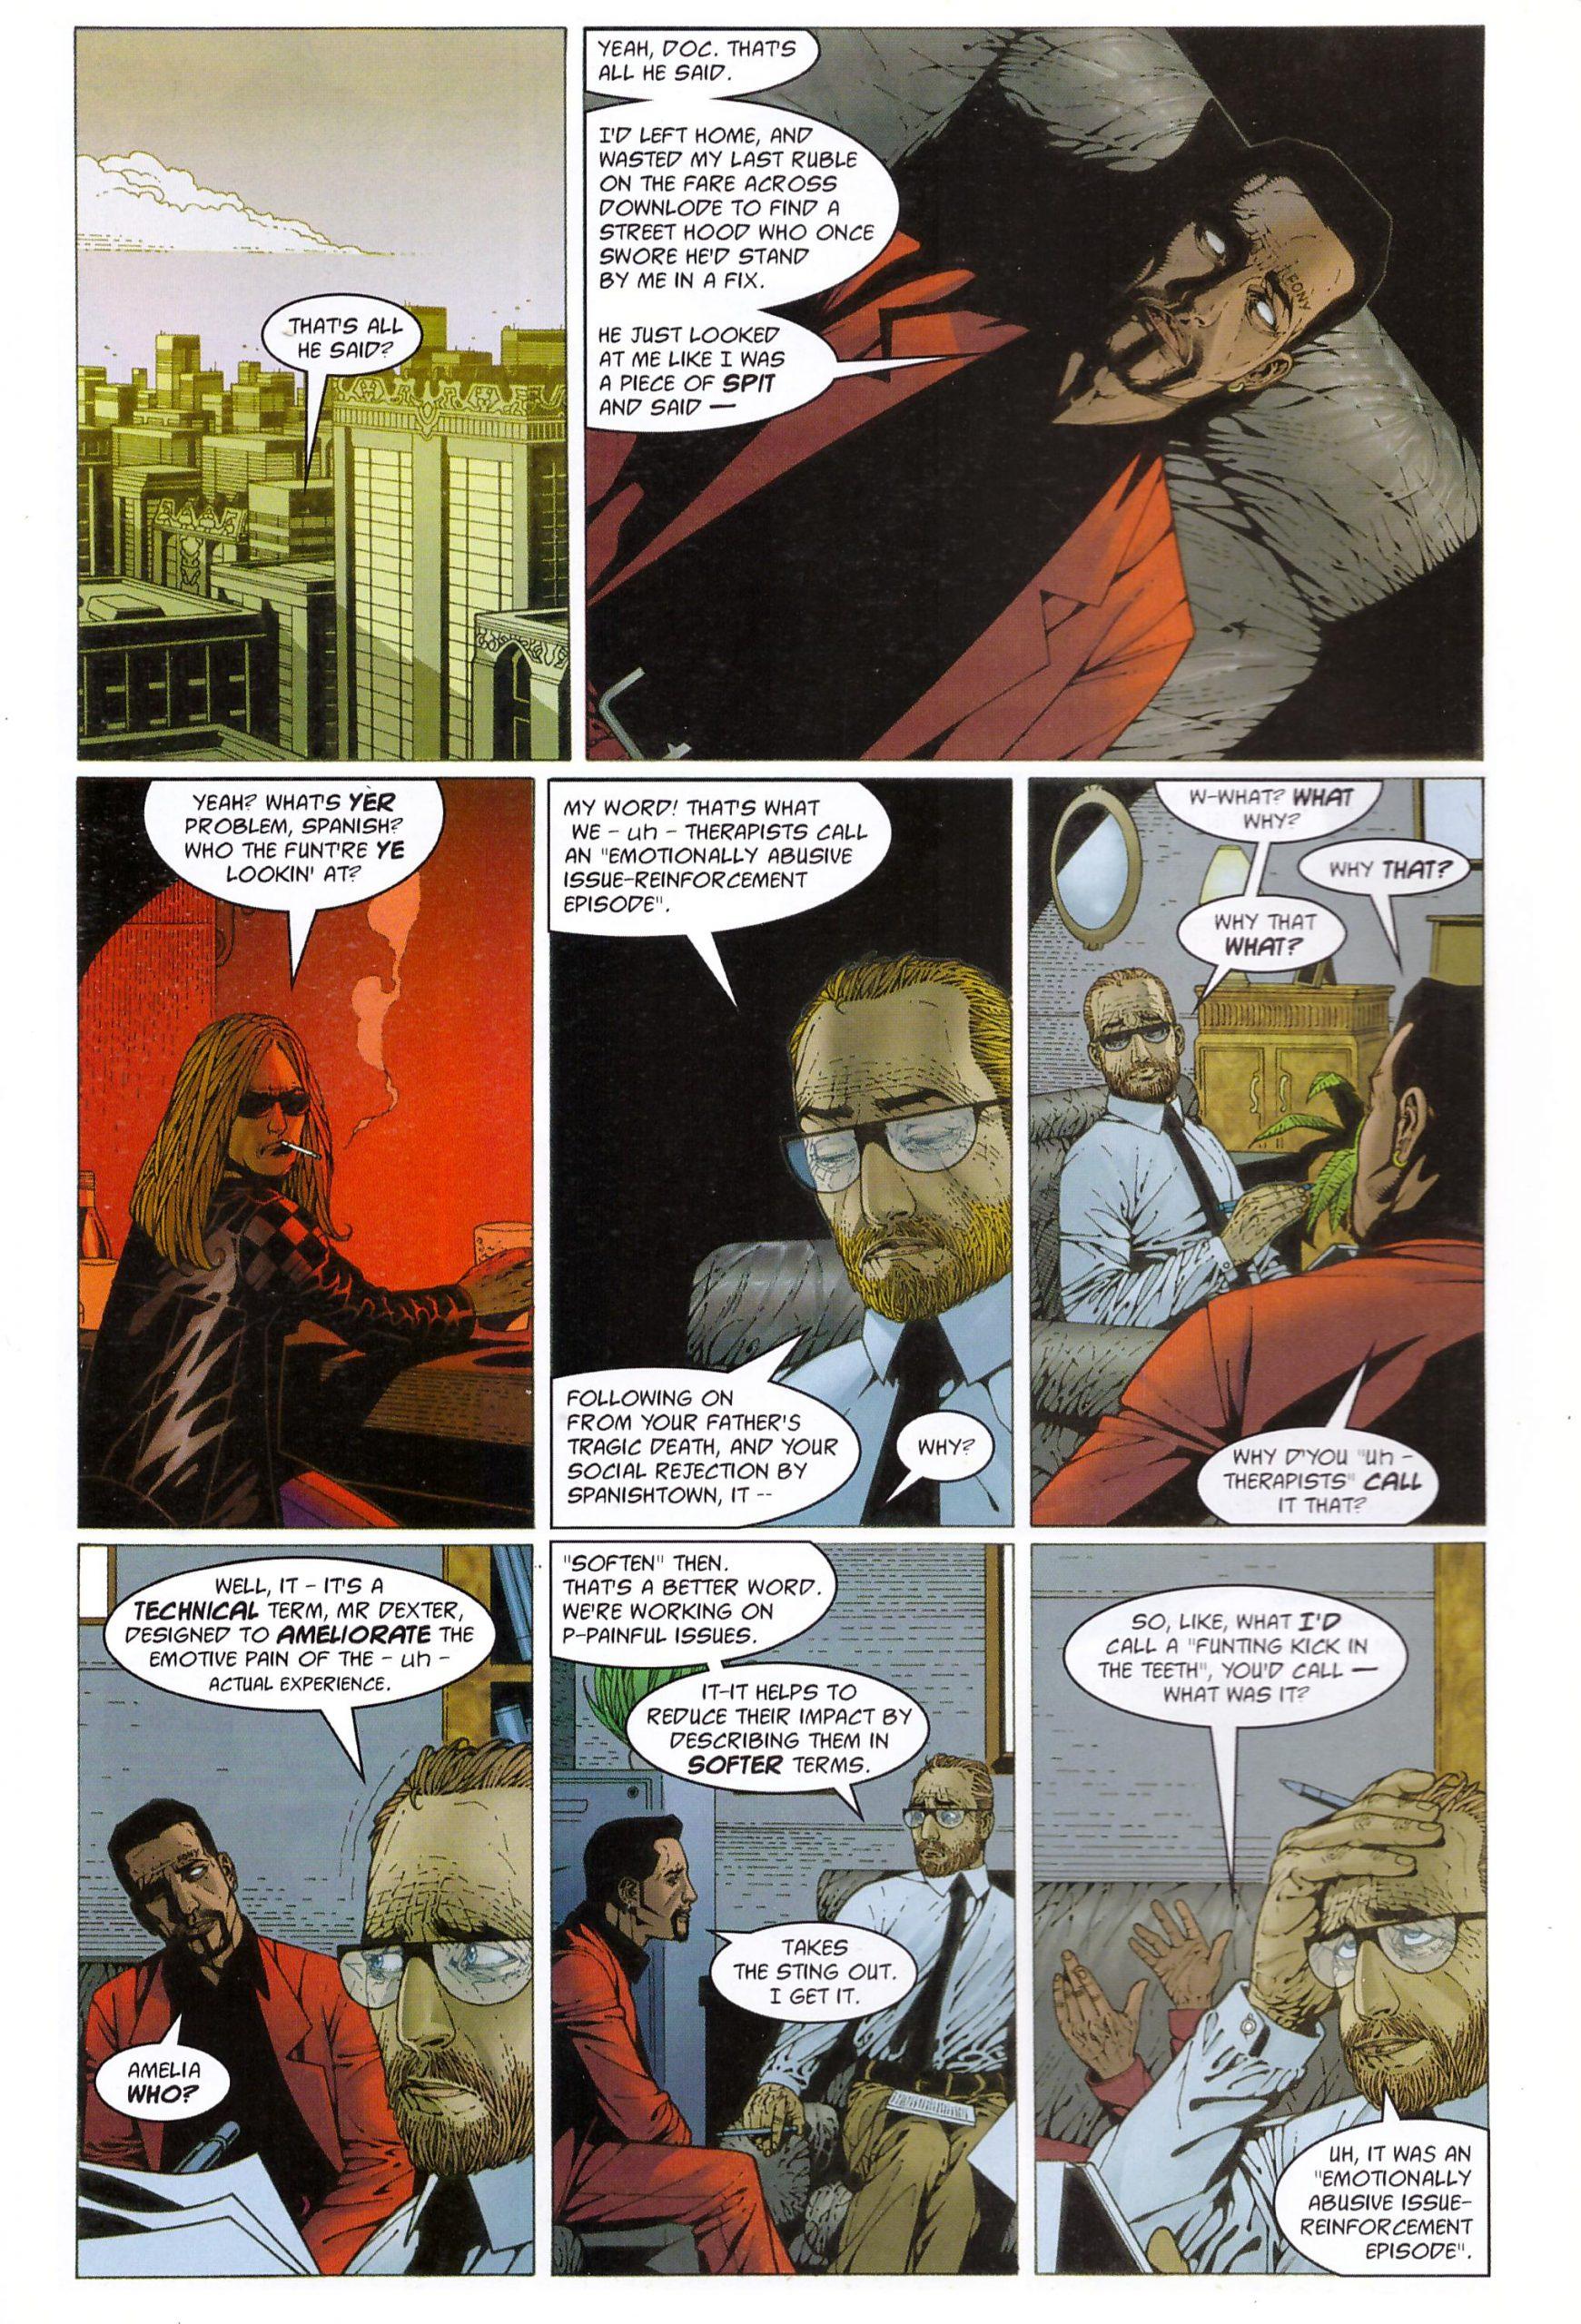 Sinister Dexter Money Shots review